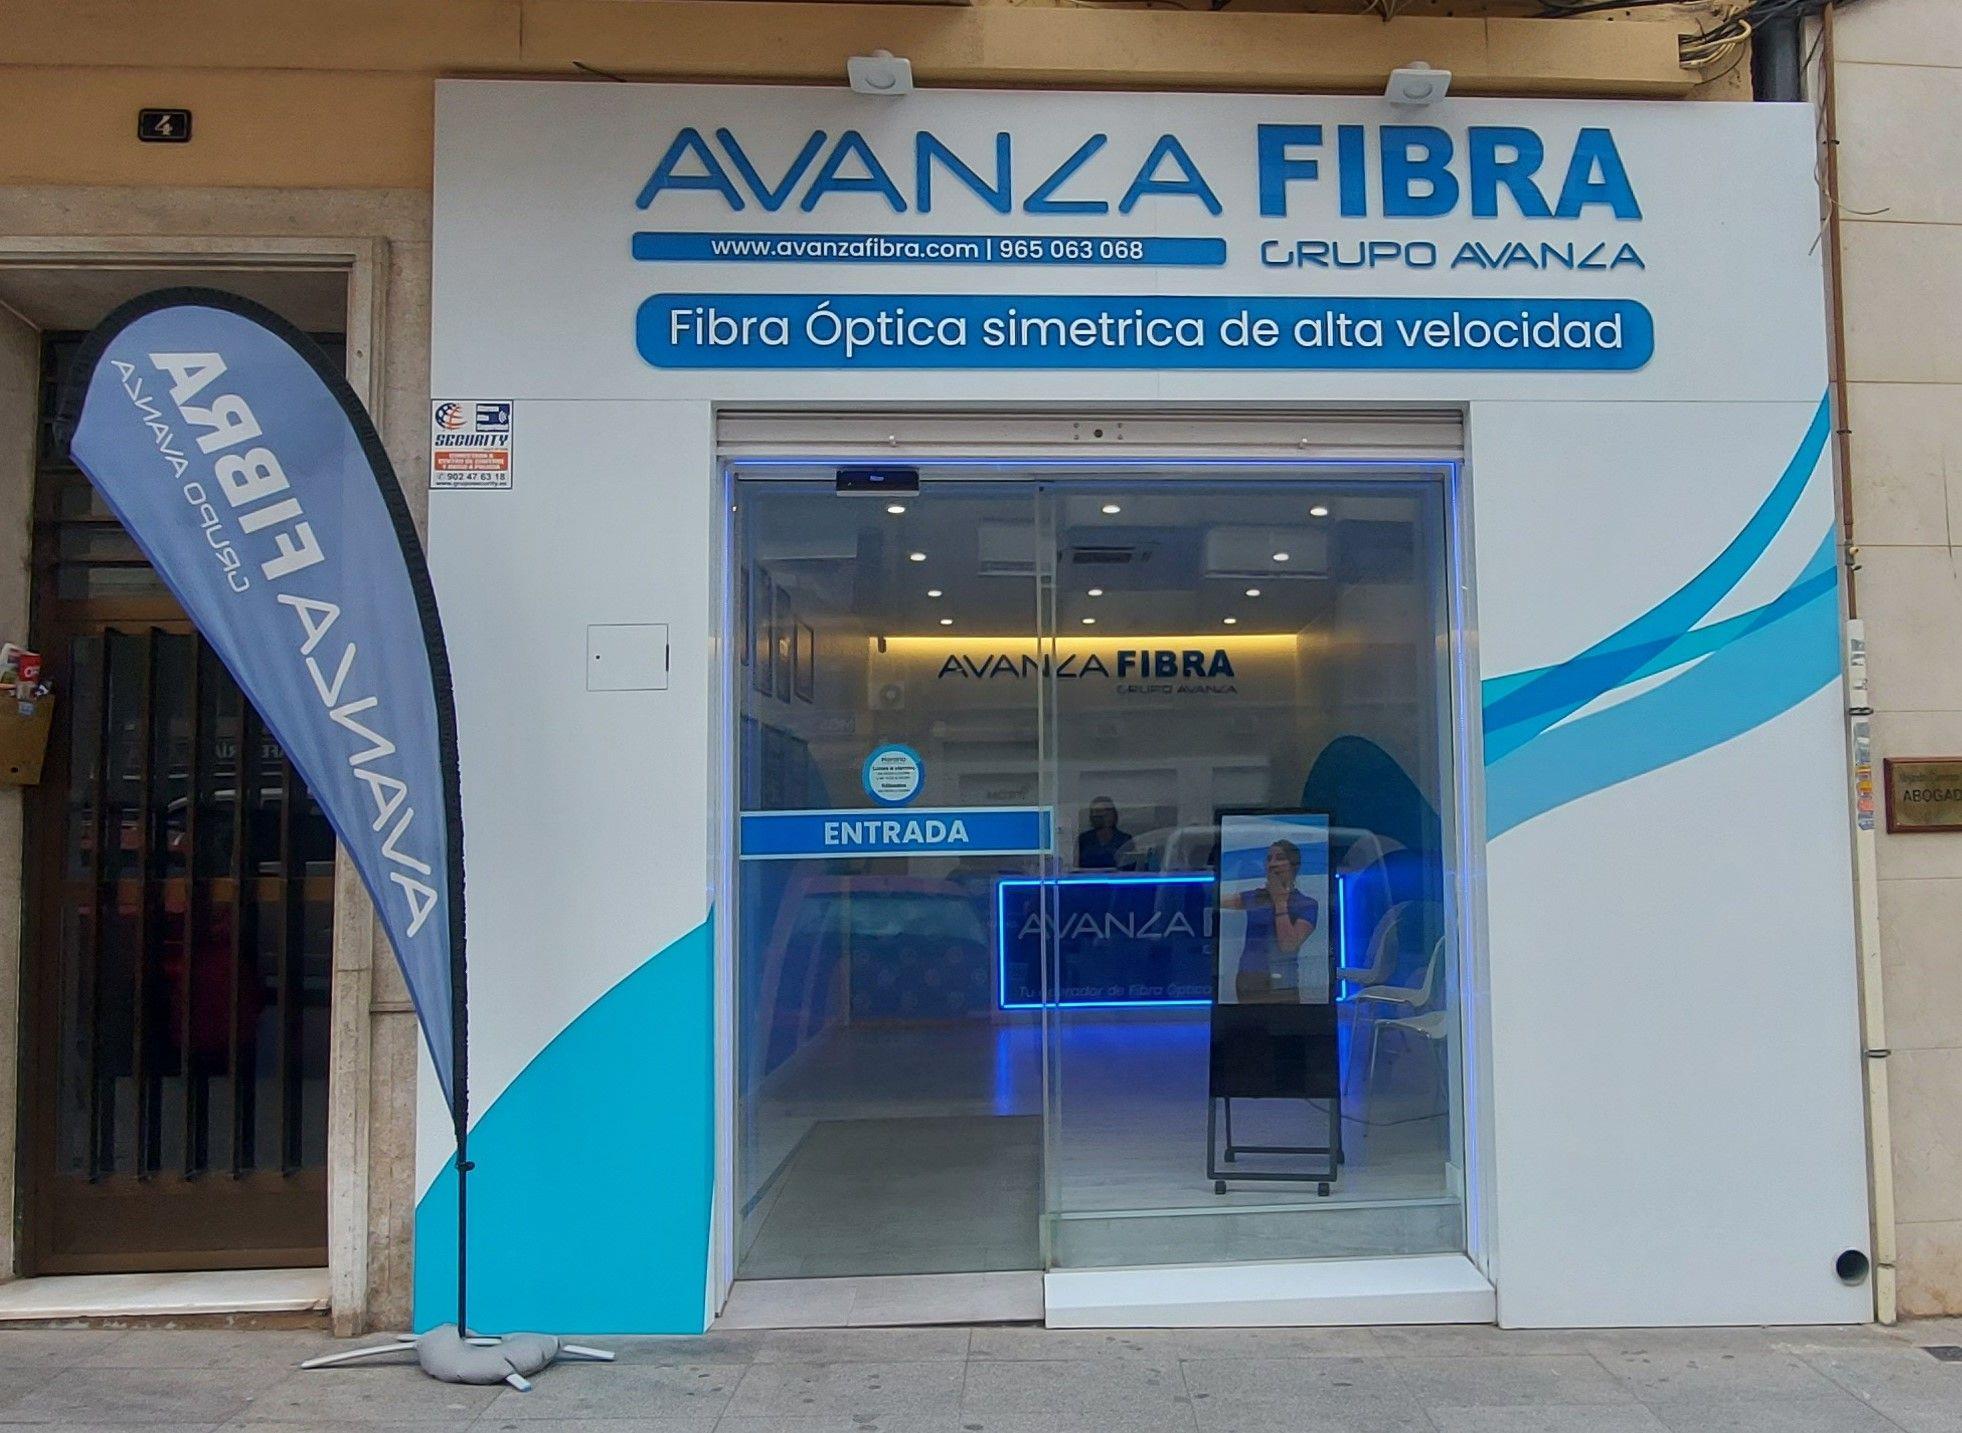 Avanza Fibra